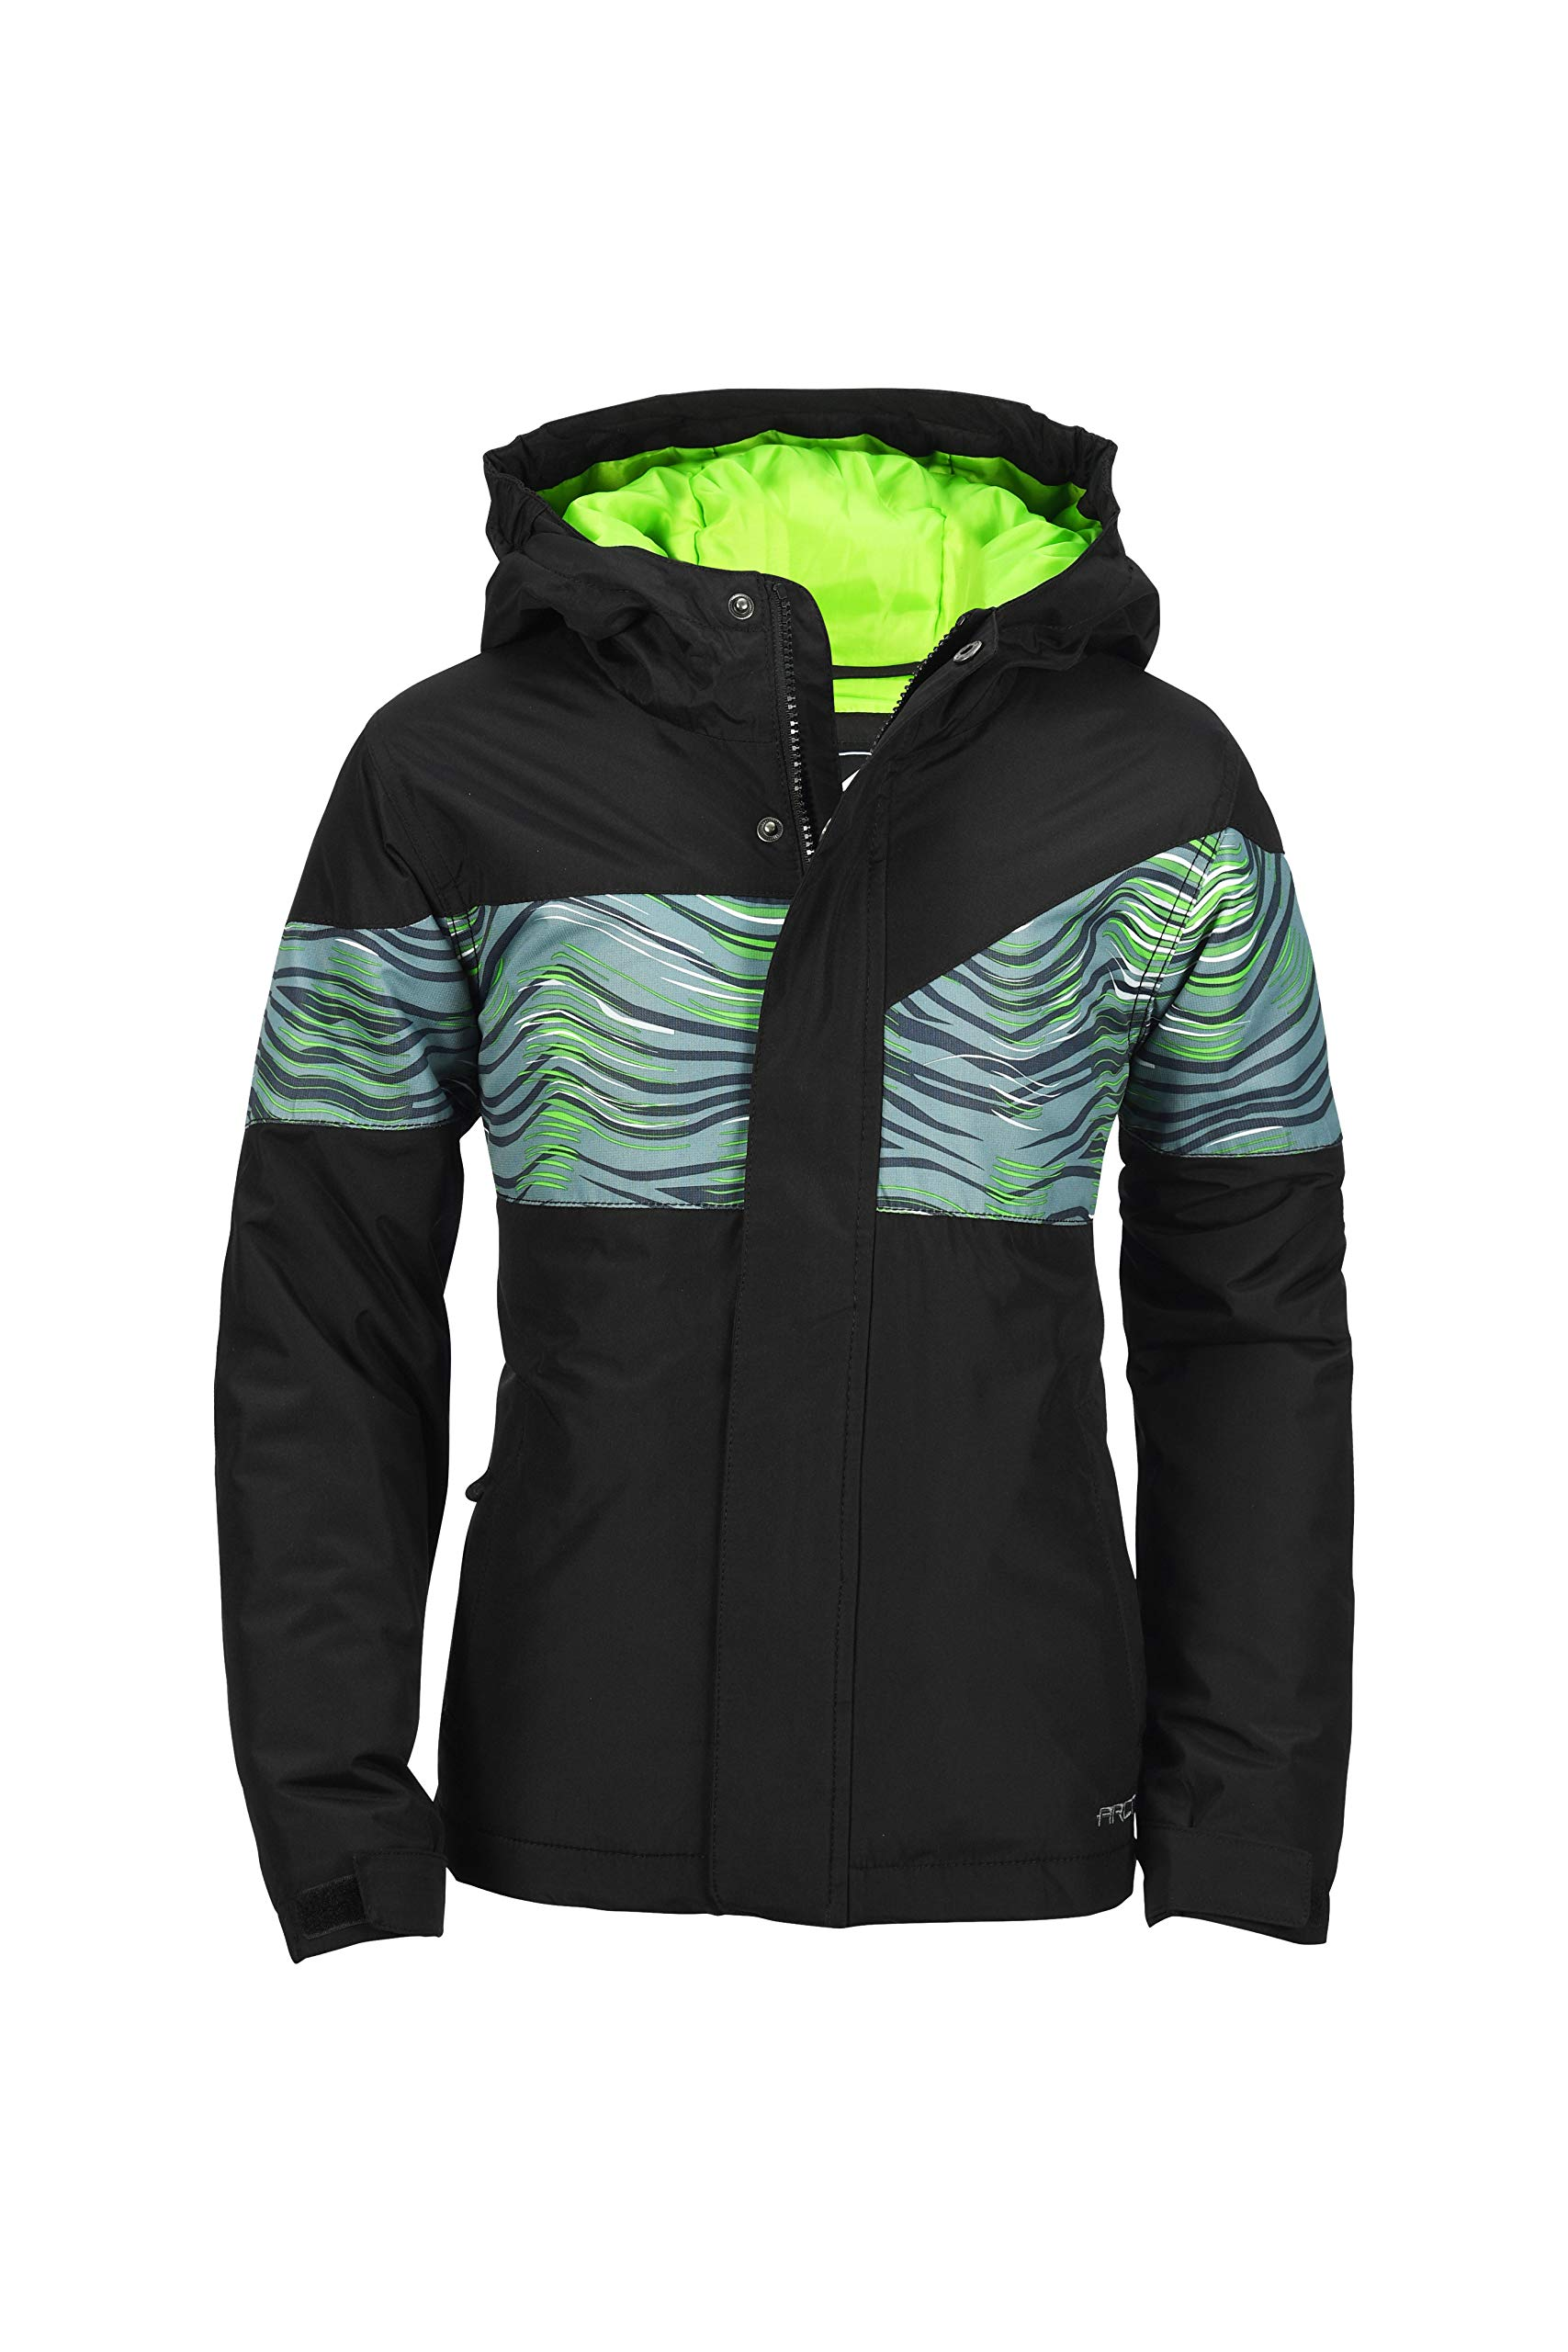 Arctix Boys Tomahawk Insulated Winter Jacket, Grey Wave, Large by Arctix